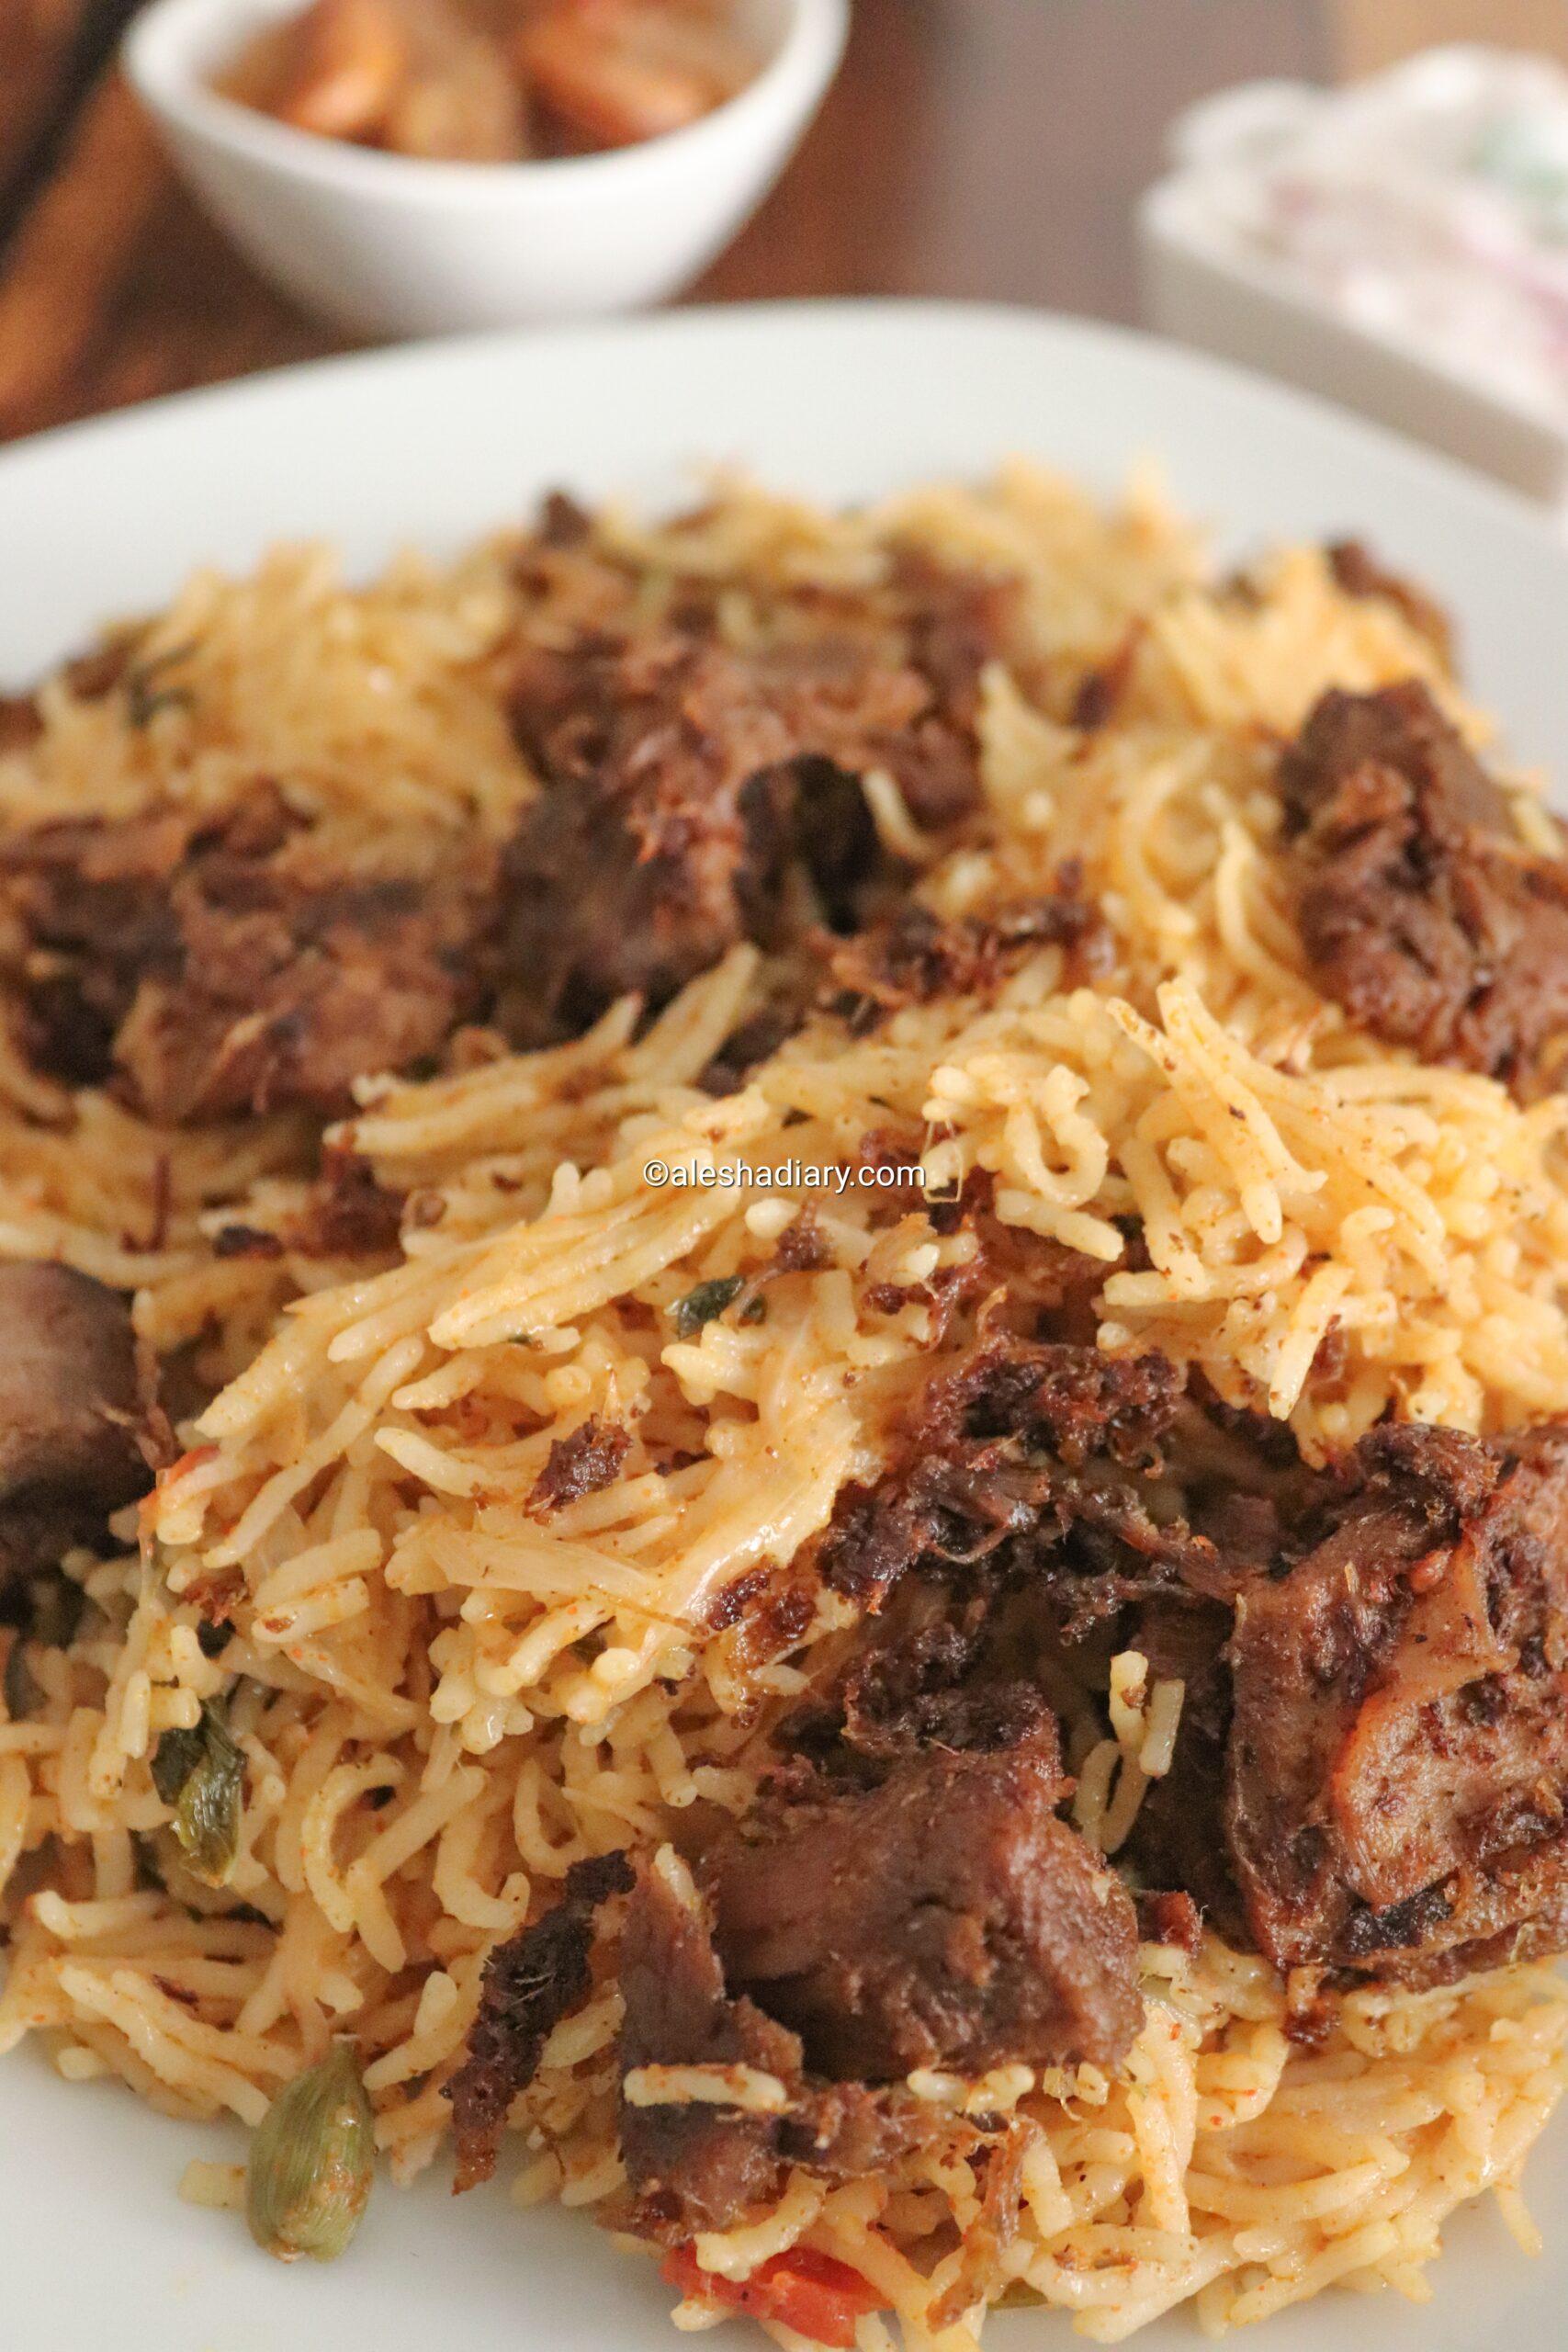 Fried mutton biryani – Biryani with fried mutton – Fried mutton piece biryani – Mutton biryani